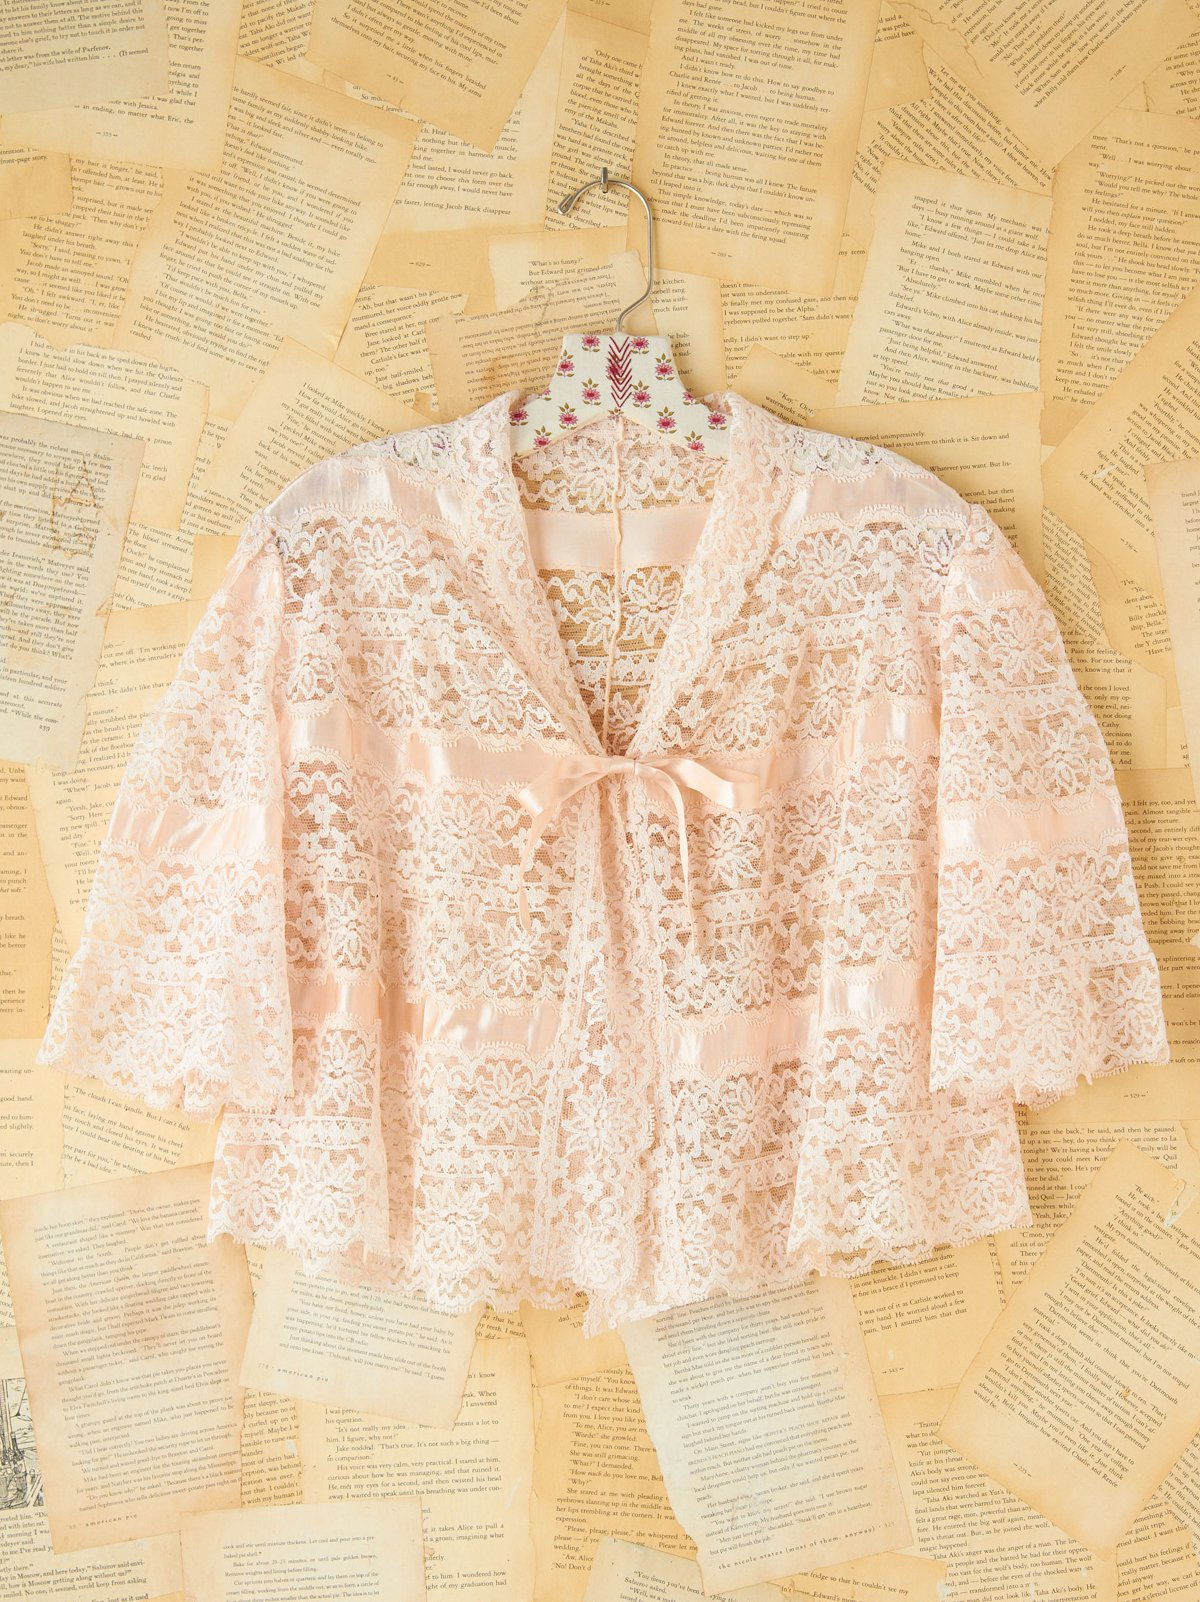 Vintage Ditsy Lace Jacket